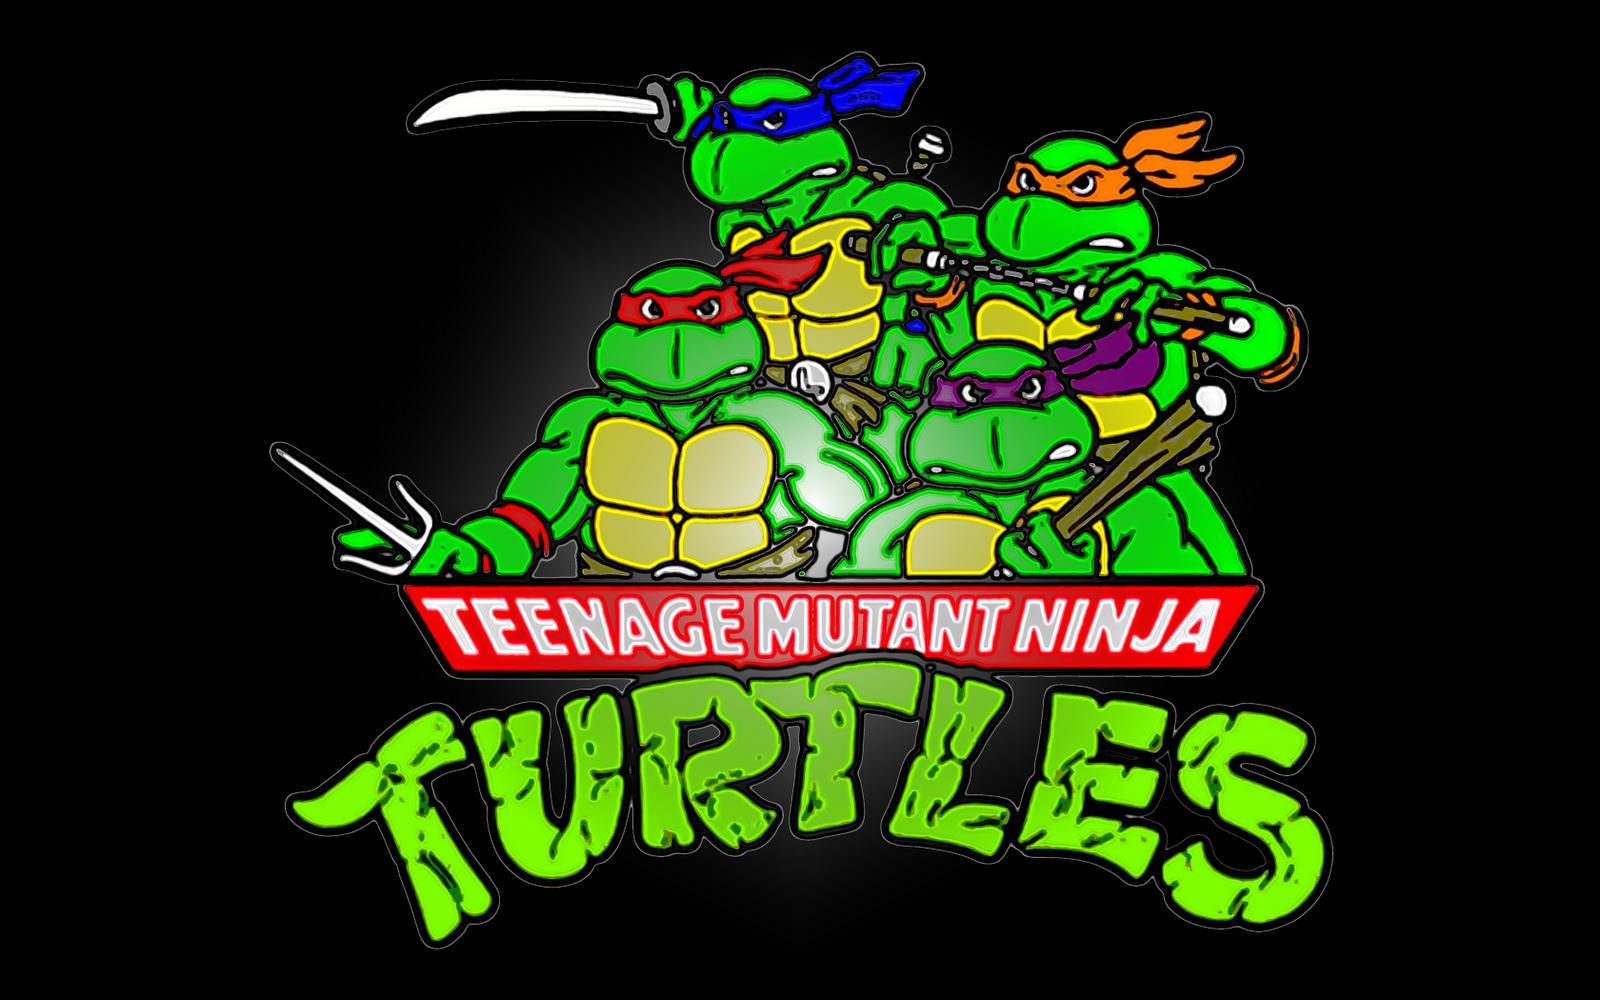 Teenage mutant ninja turtles comic wallpaper - photo#9